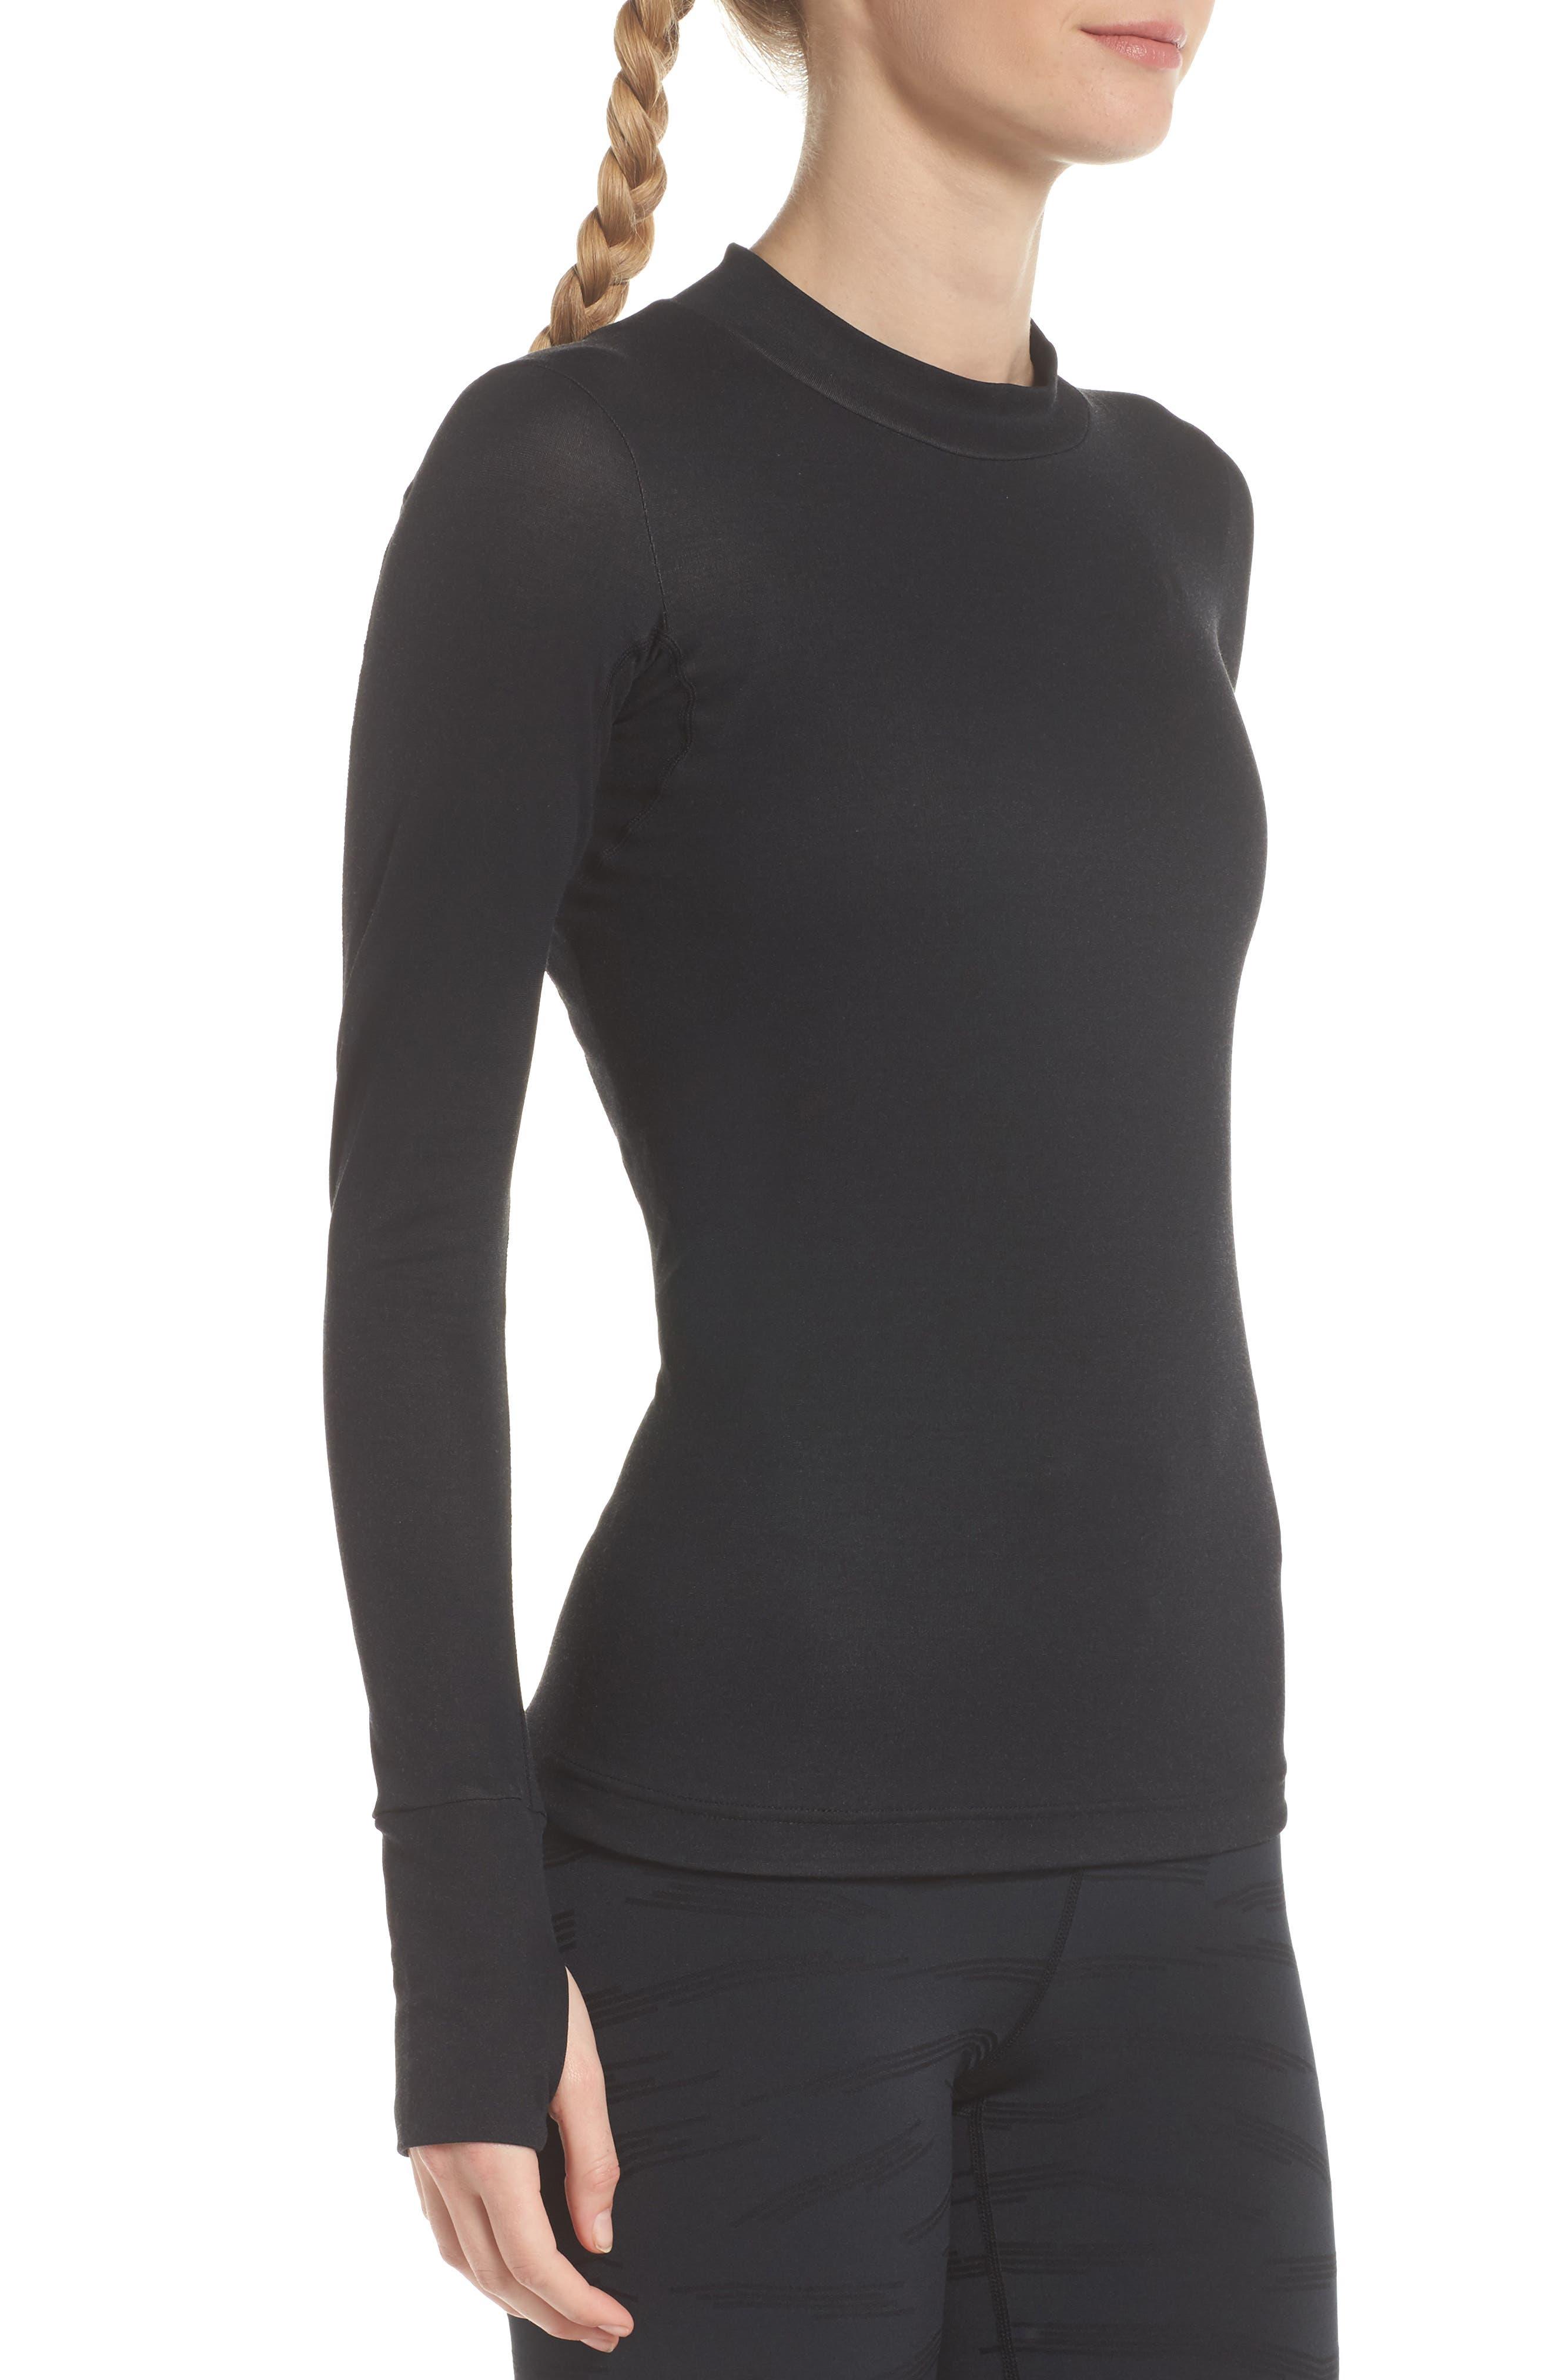 NikeLab ACG Long Sleeve Women's Top,                             Alternate thumbnail 3, color,                             010